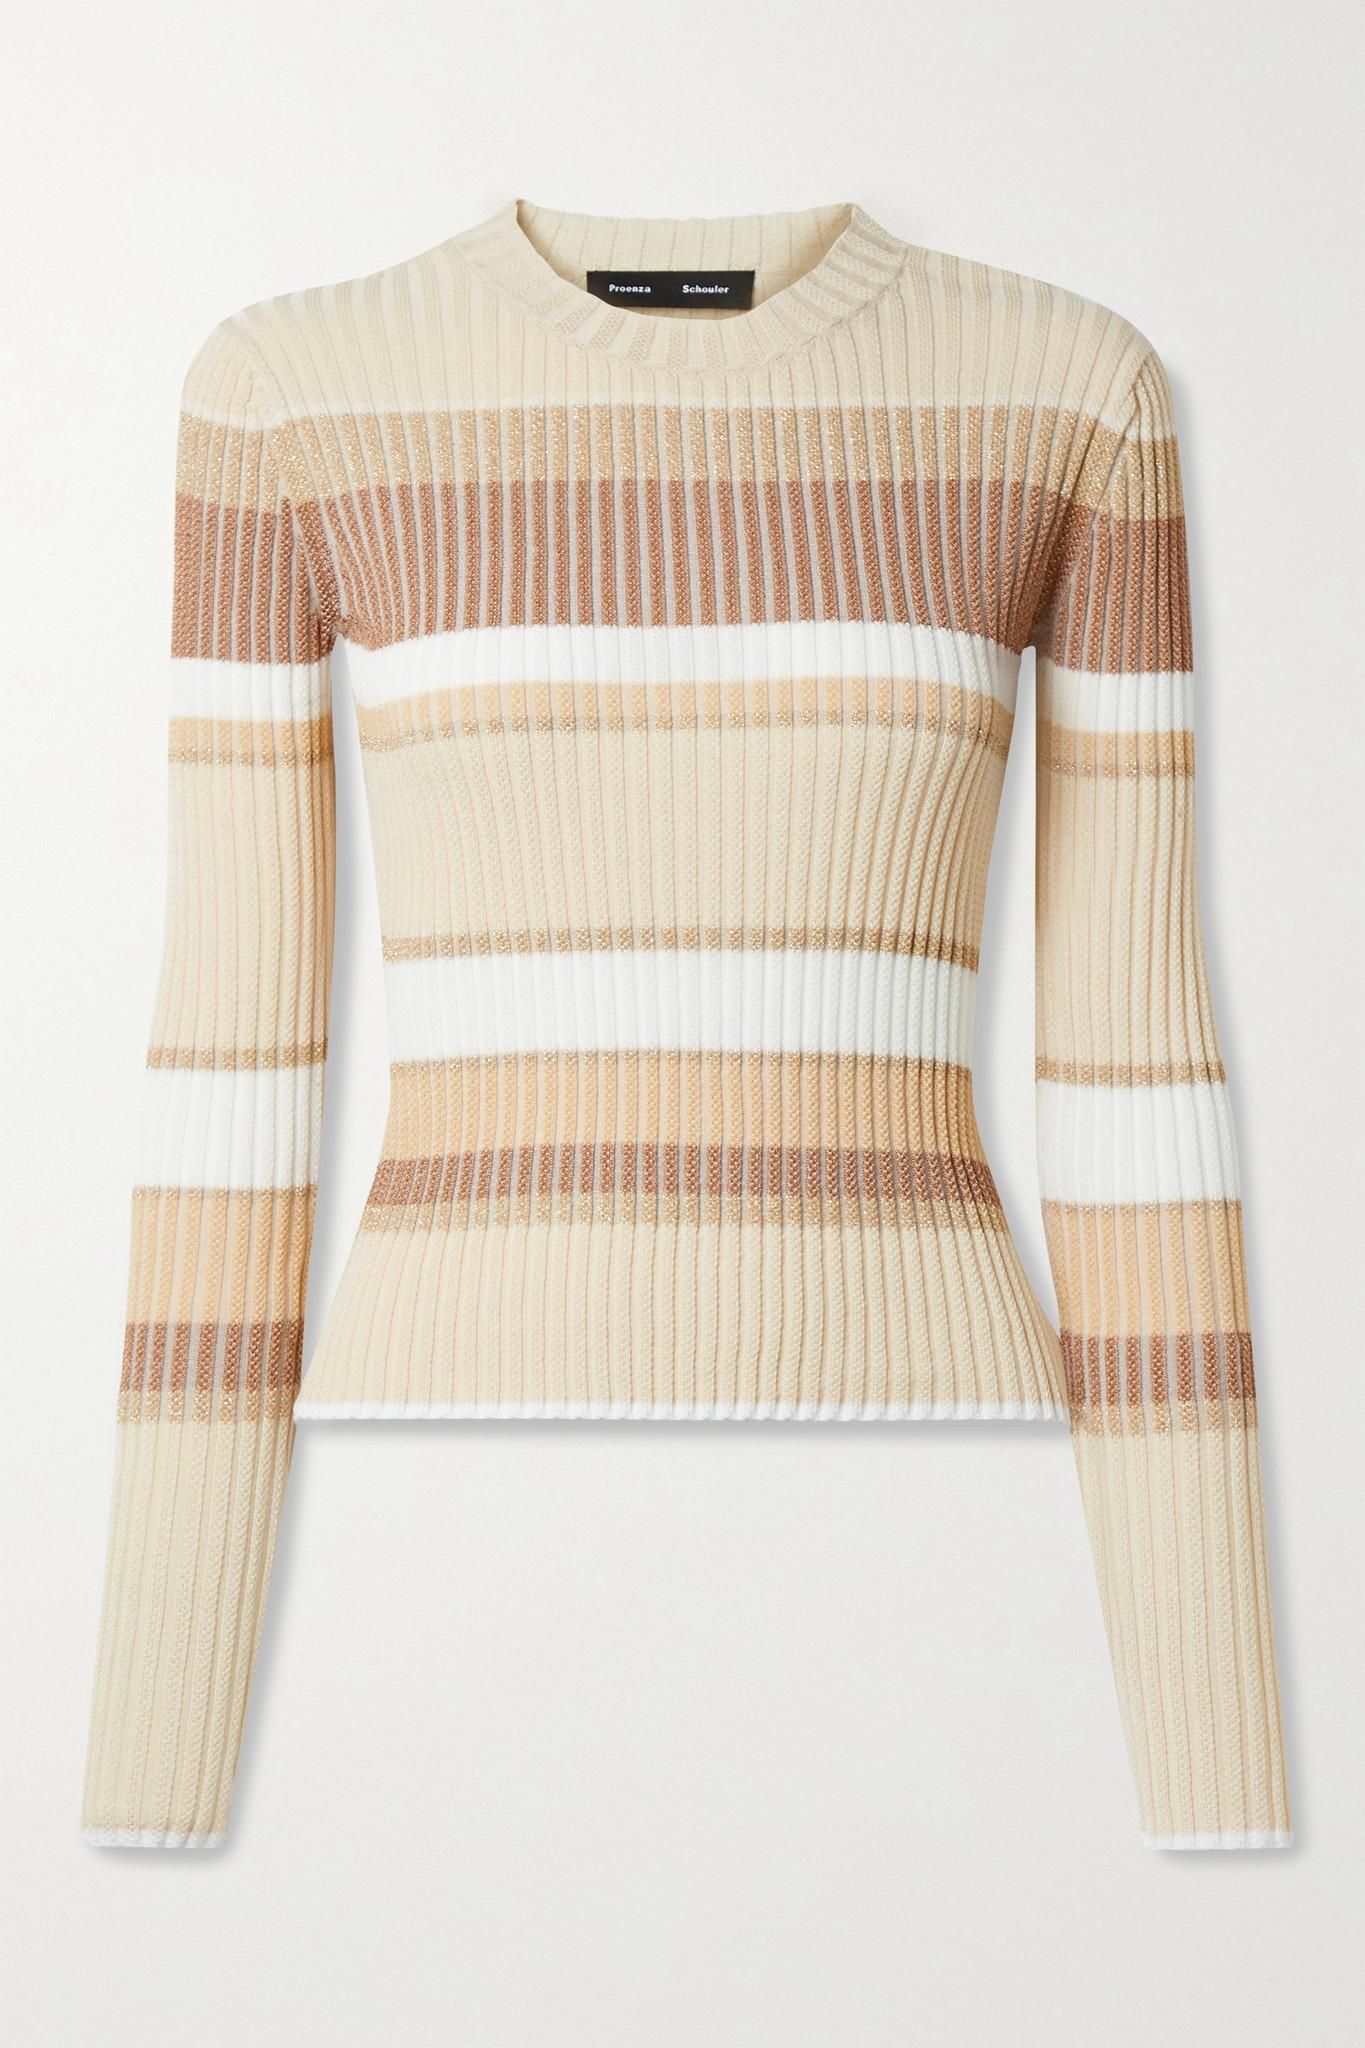 PROENZA SCHOULER - Metallic Striped Ribbed-knit Sweater - Neutrals - small